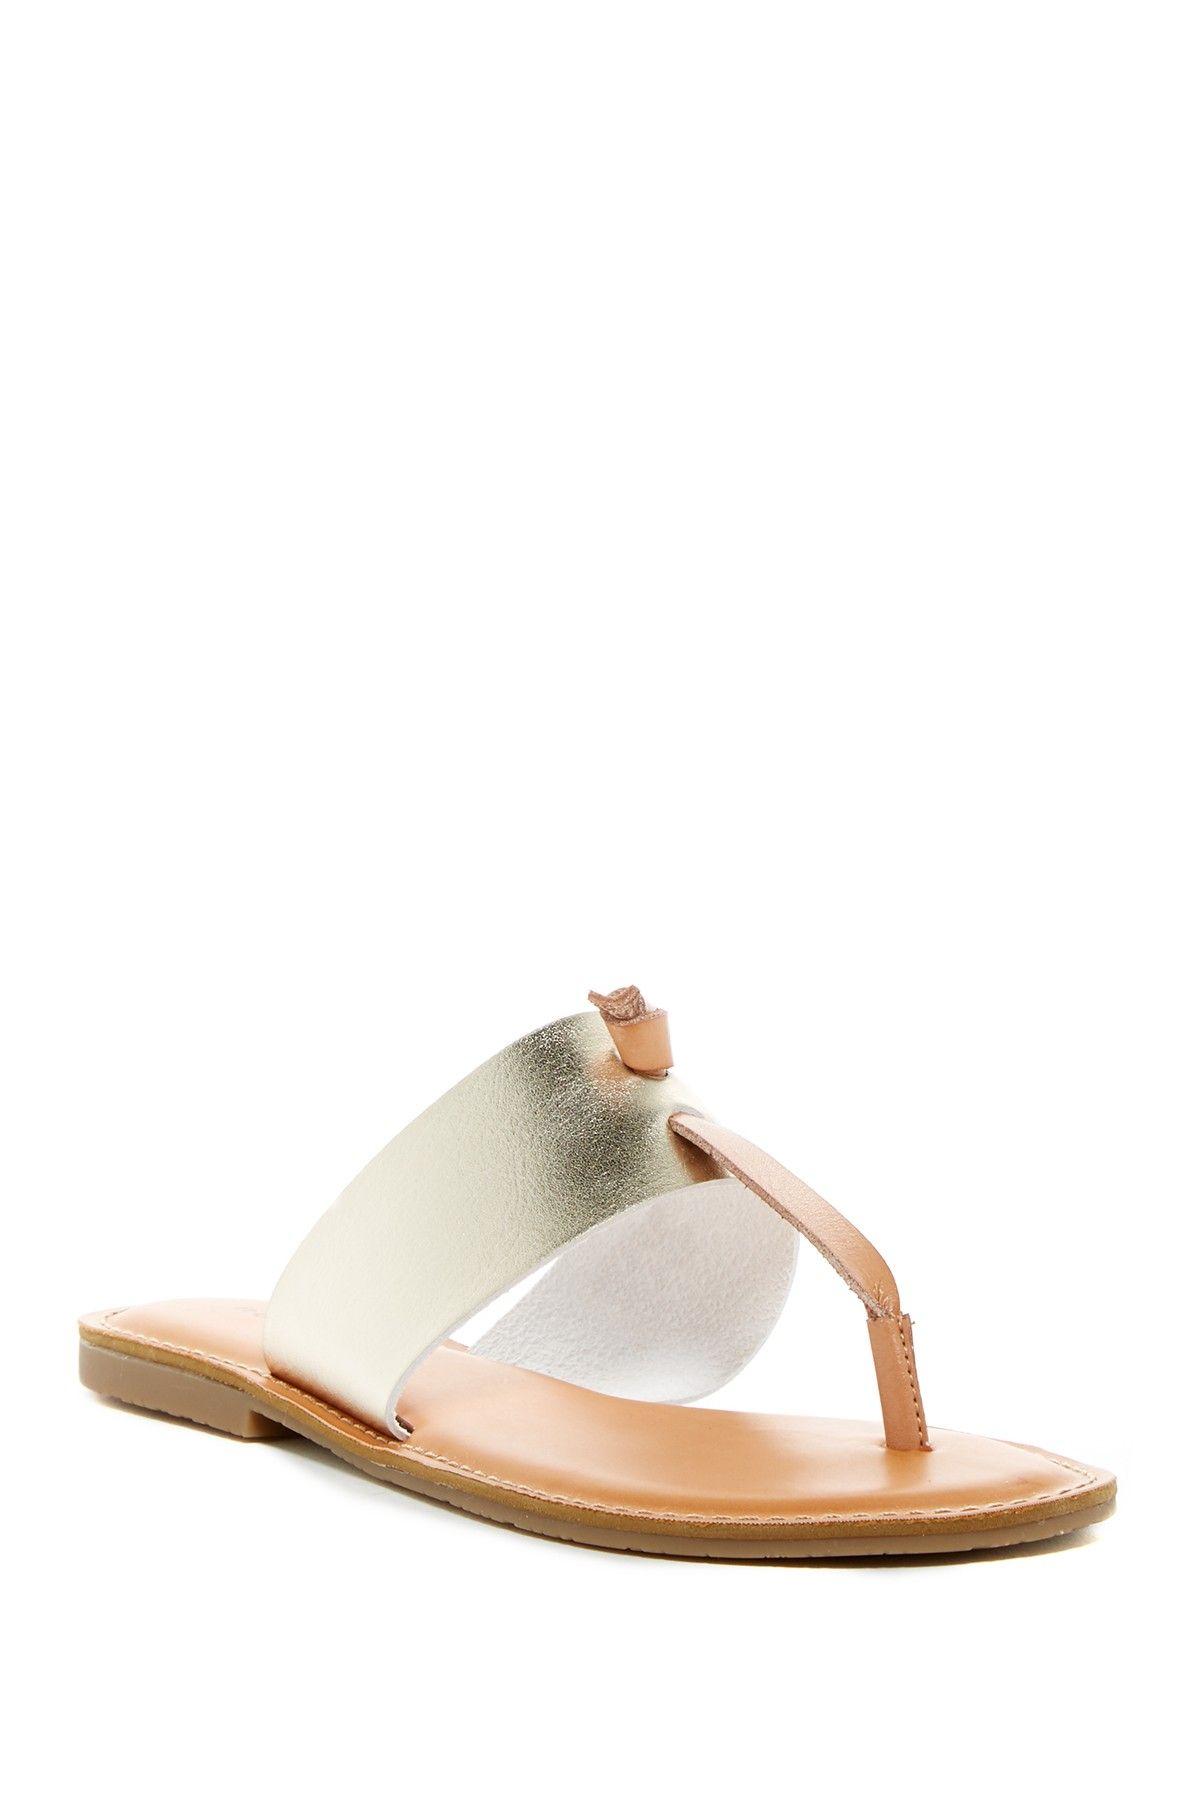 Blaney Thong Sandal